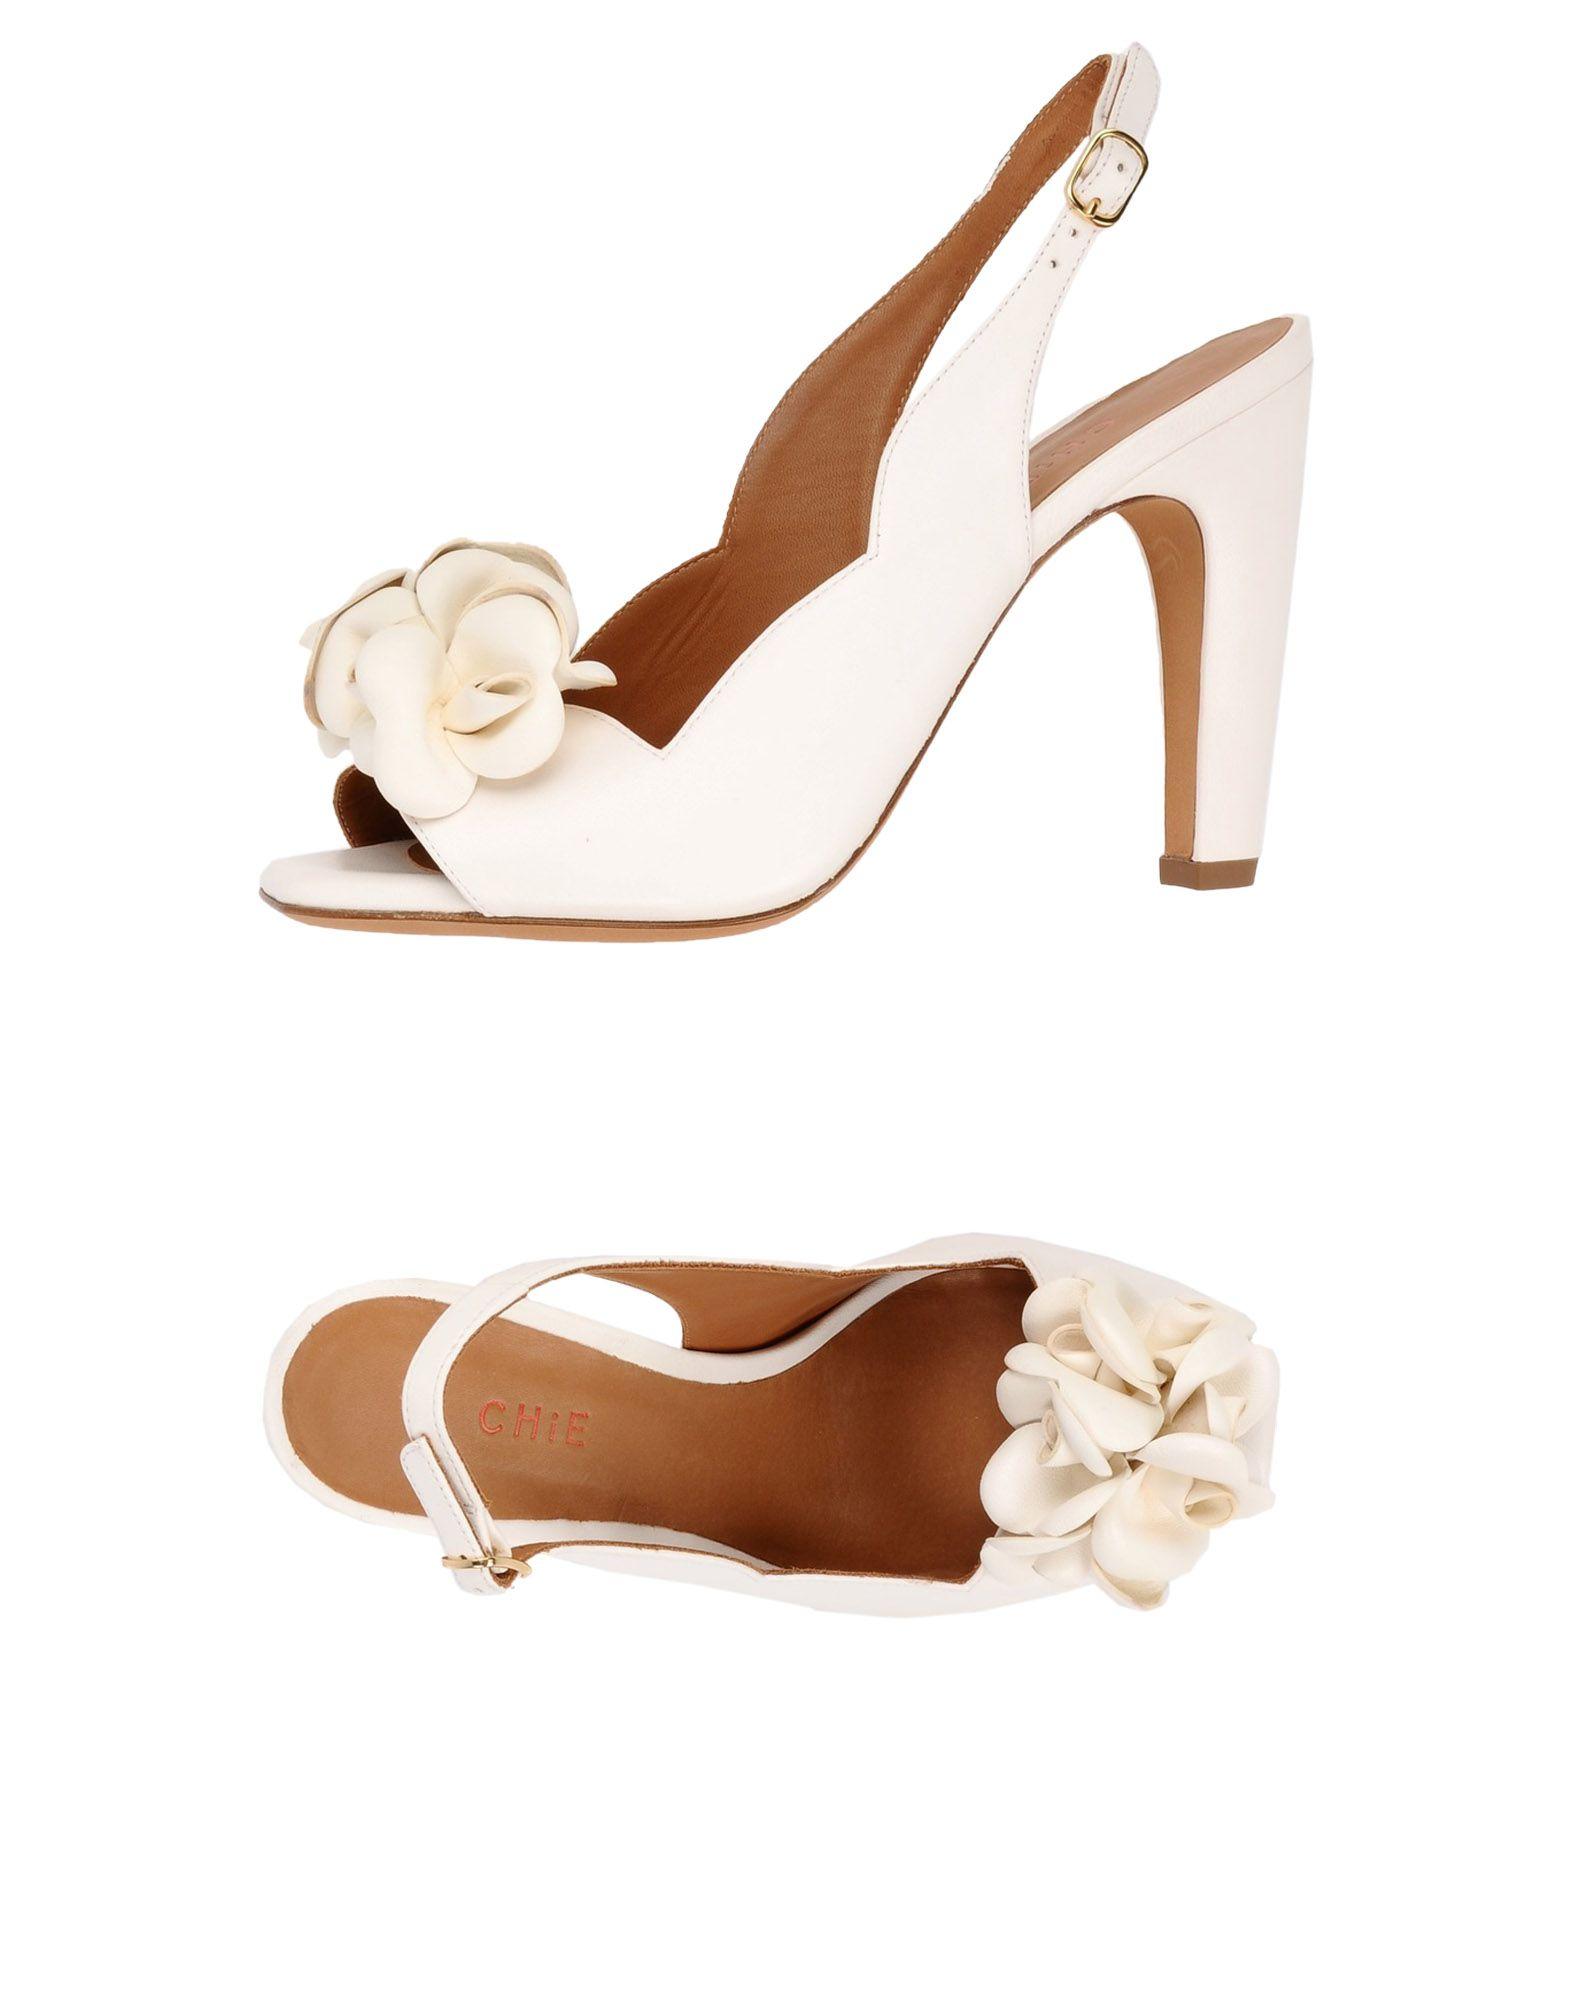 Chie By Chie Bri-Tejo Mihara Bri-Tejo Chie - Sandals - Women Chie By Chie Mihara Sandals online on  United Kingdom - 11429582QC eea55a